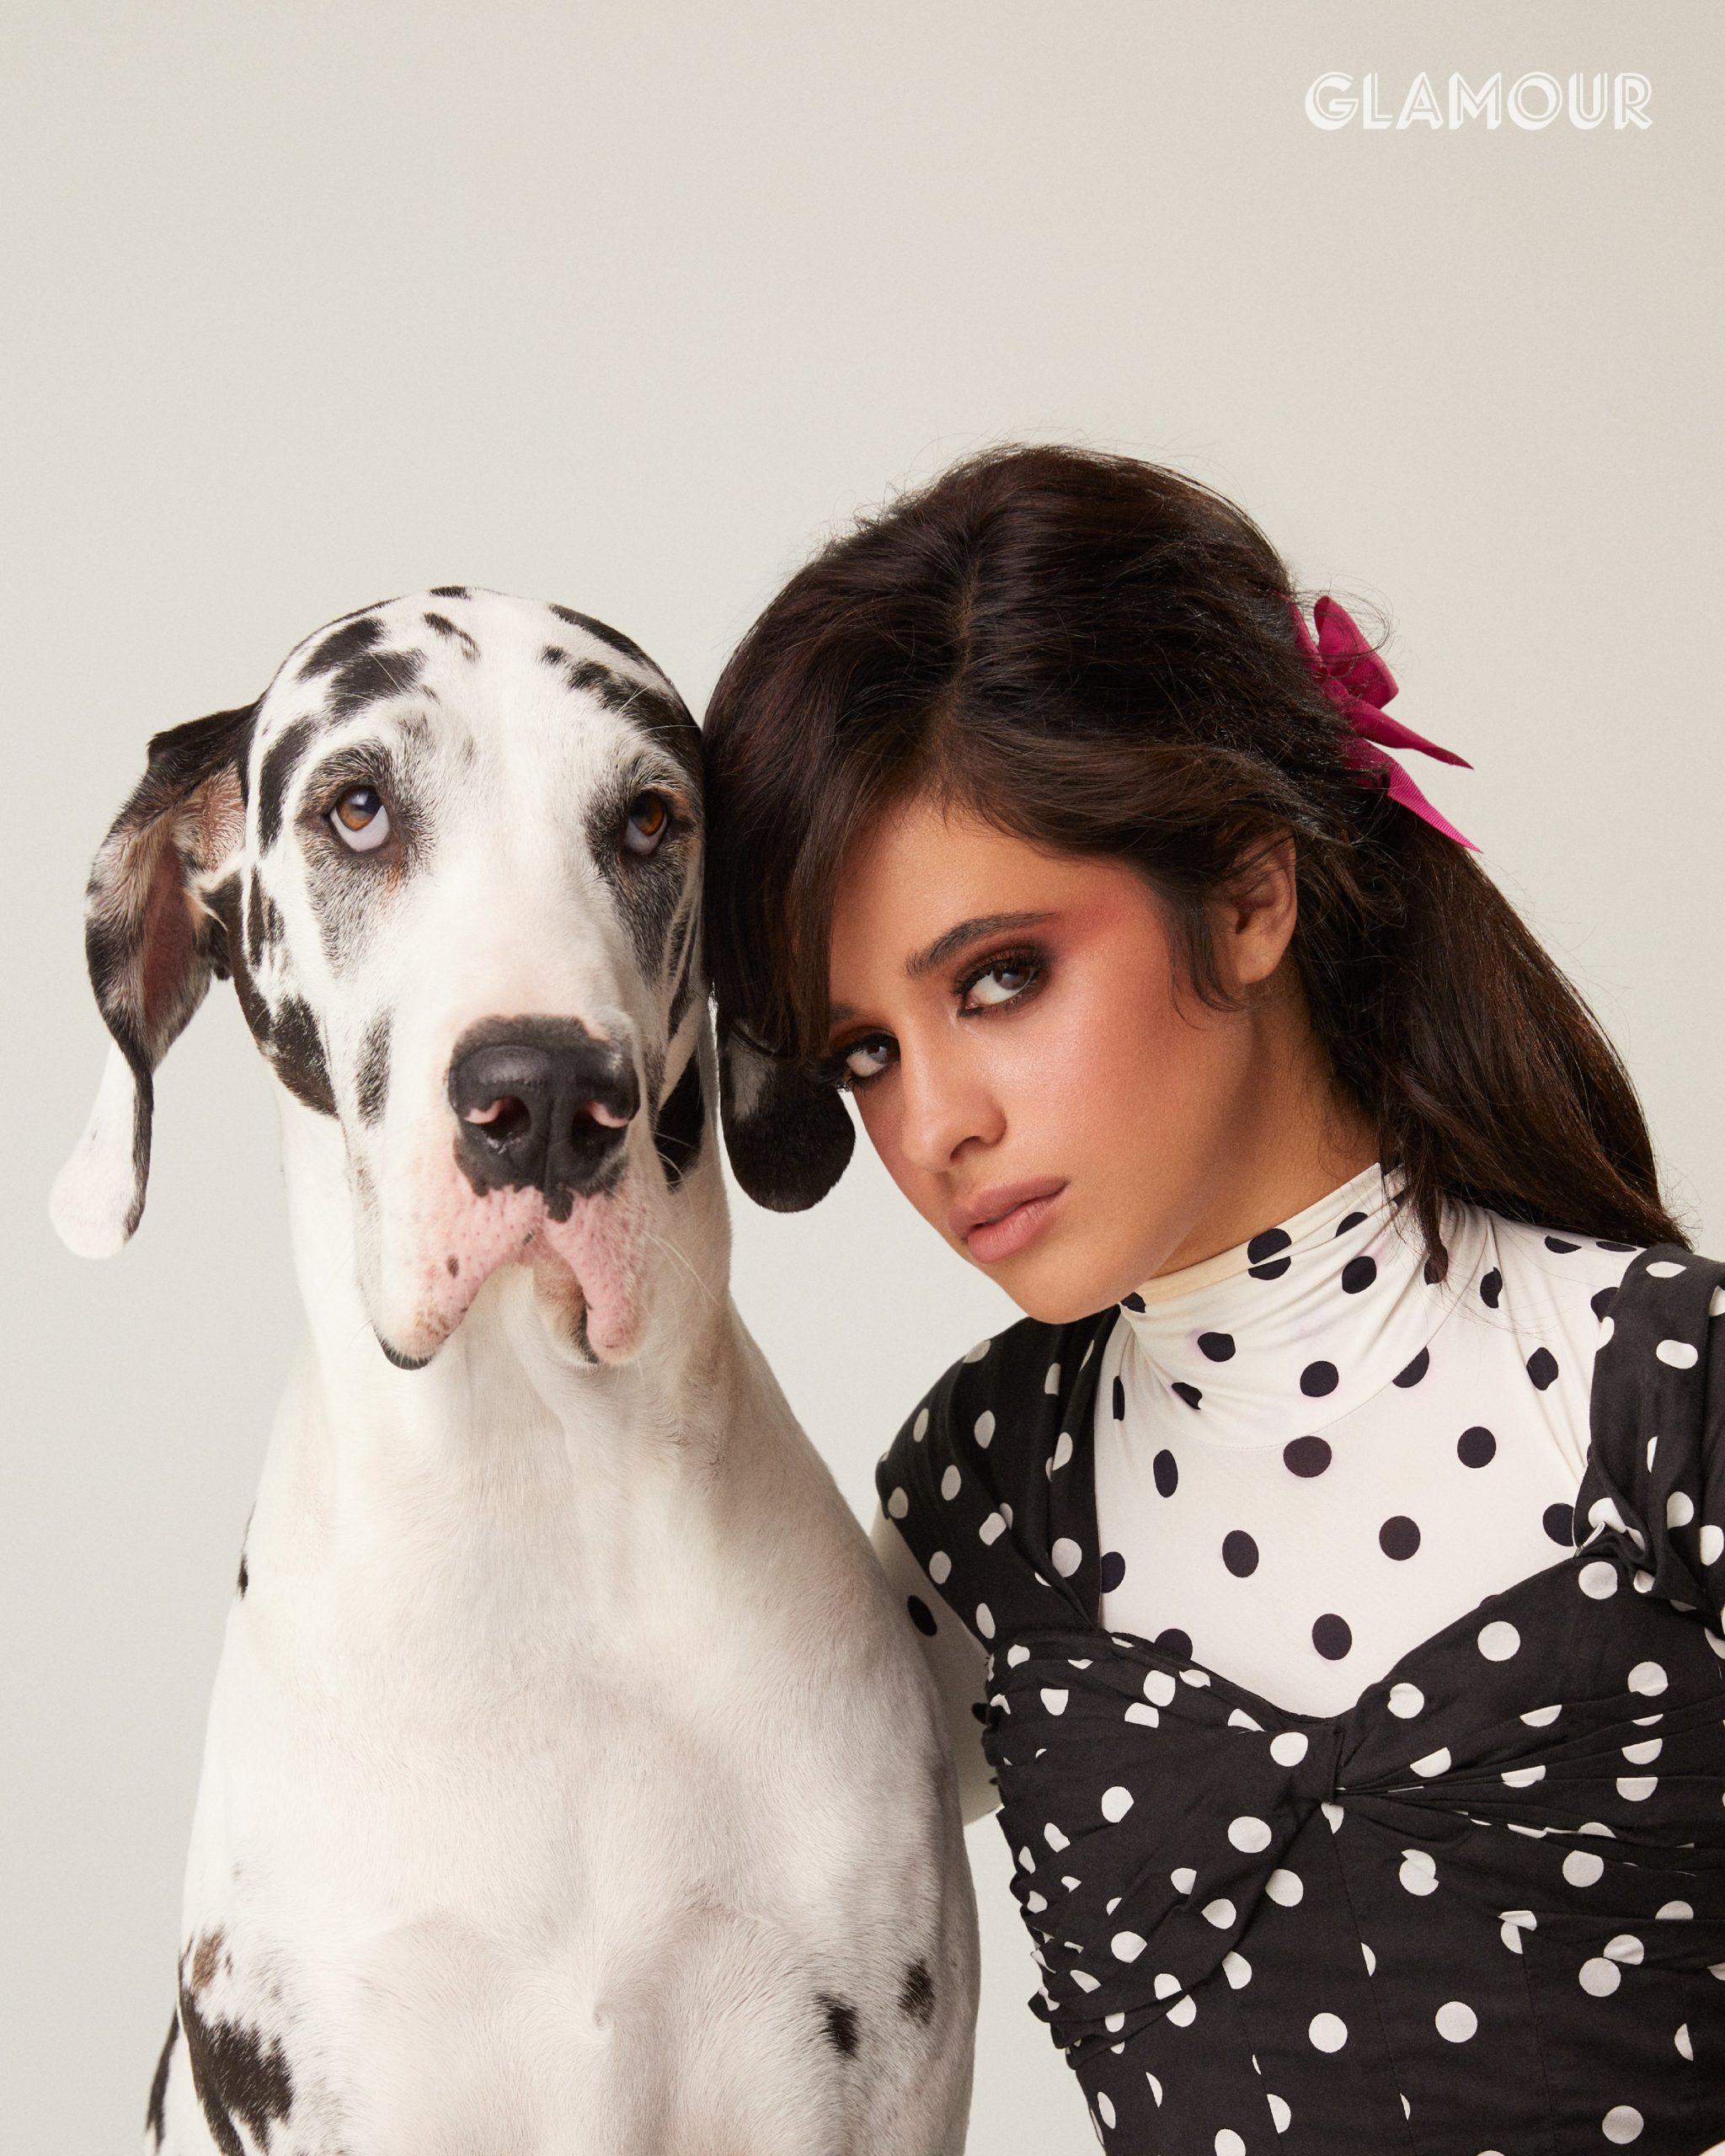 Camila Cabello Glamour 2021 5 min scaled - Фото: Camila Cabello на обложке журнала Glamour